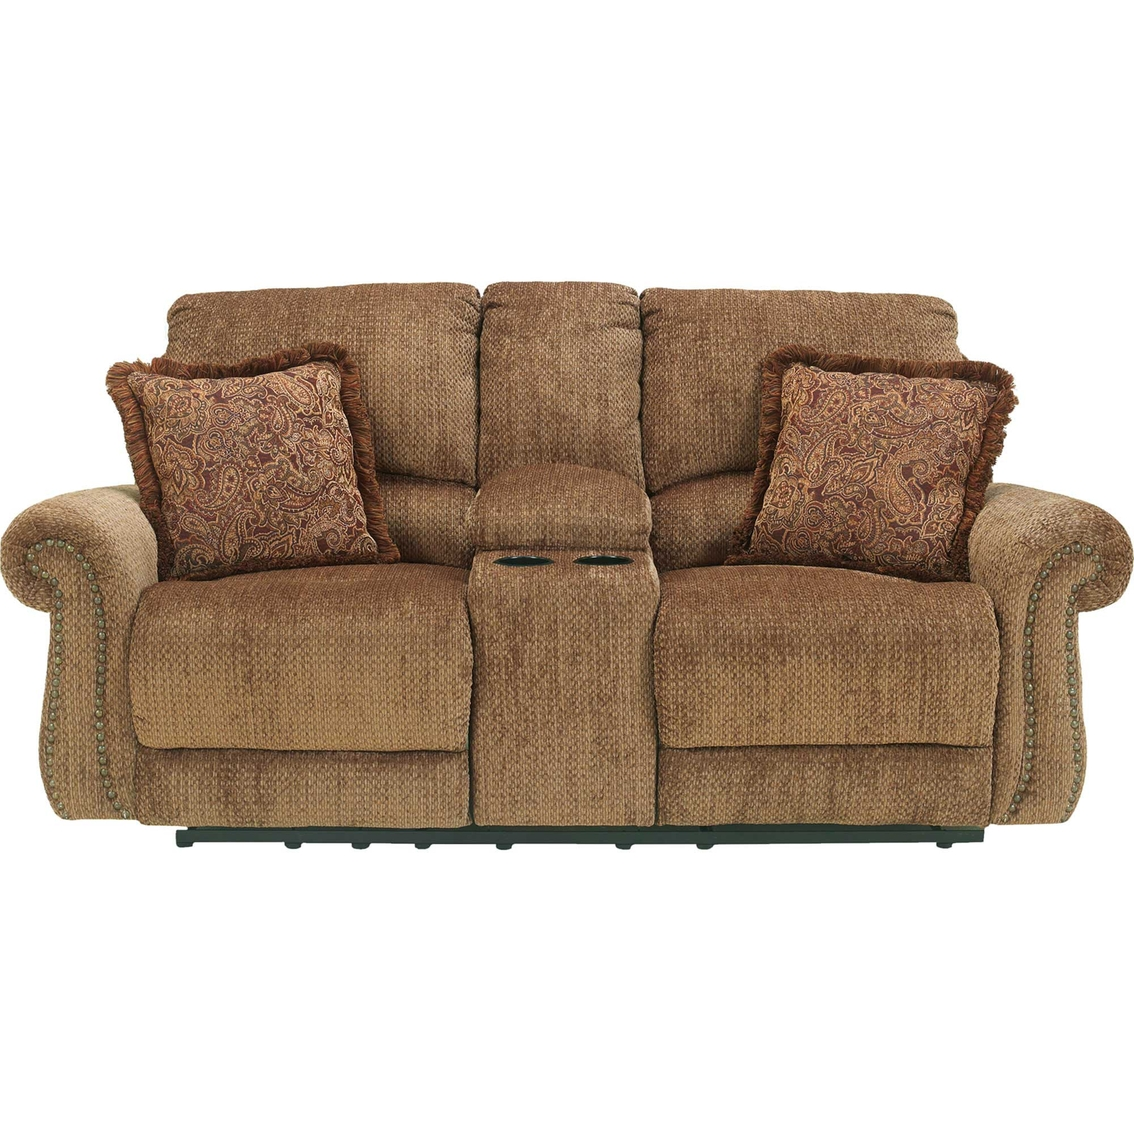 ashley reclining sofa disembly seat height furniture repair